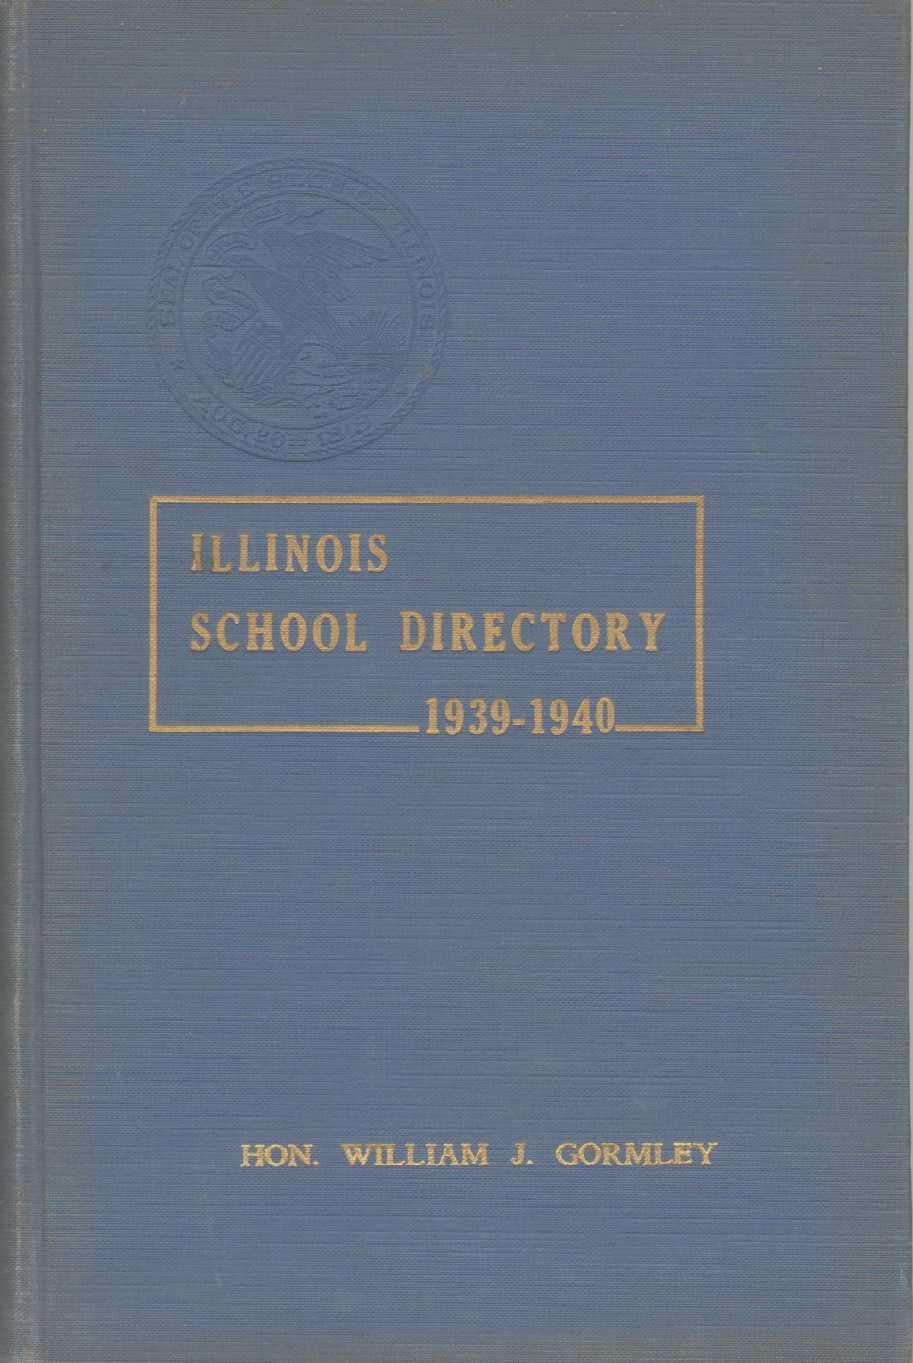 Image for ILLINOIS SCHOOL DIRECTORY 1939-1940 Illinois Teachers for Illinois Schools Circular 310